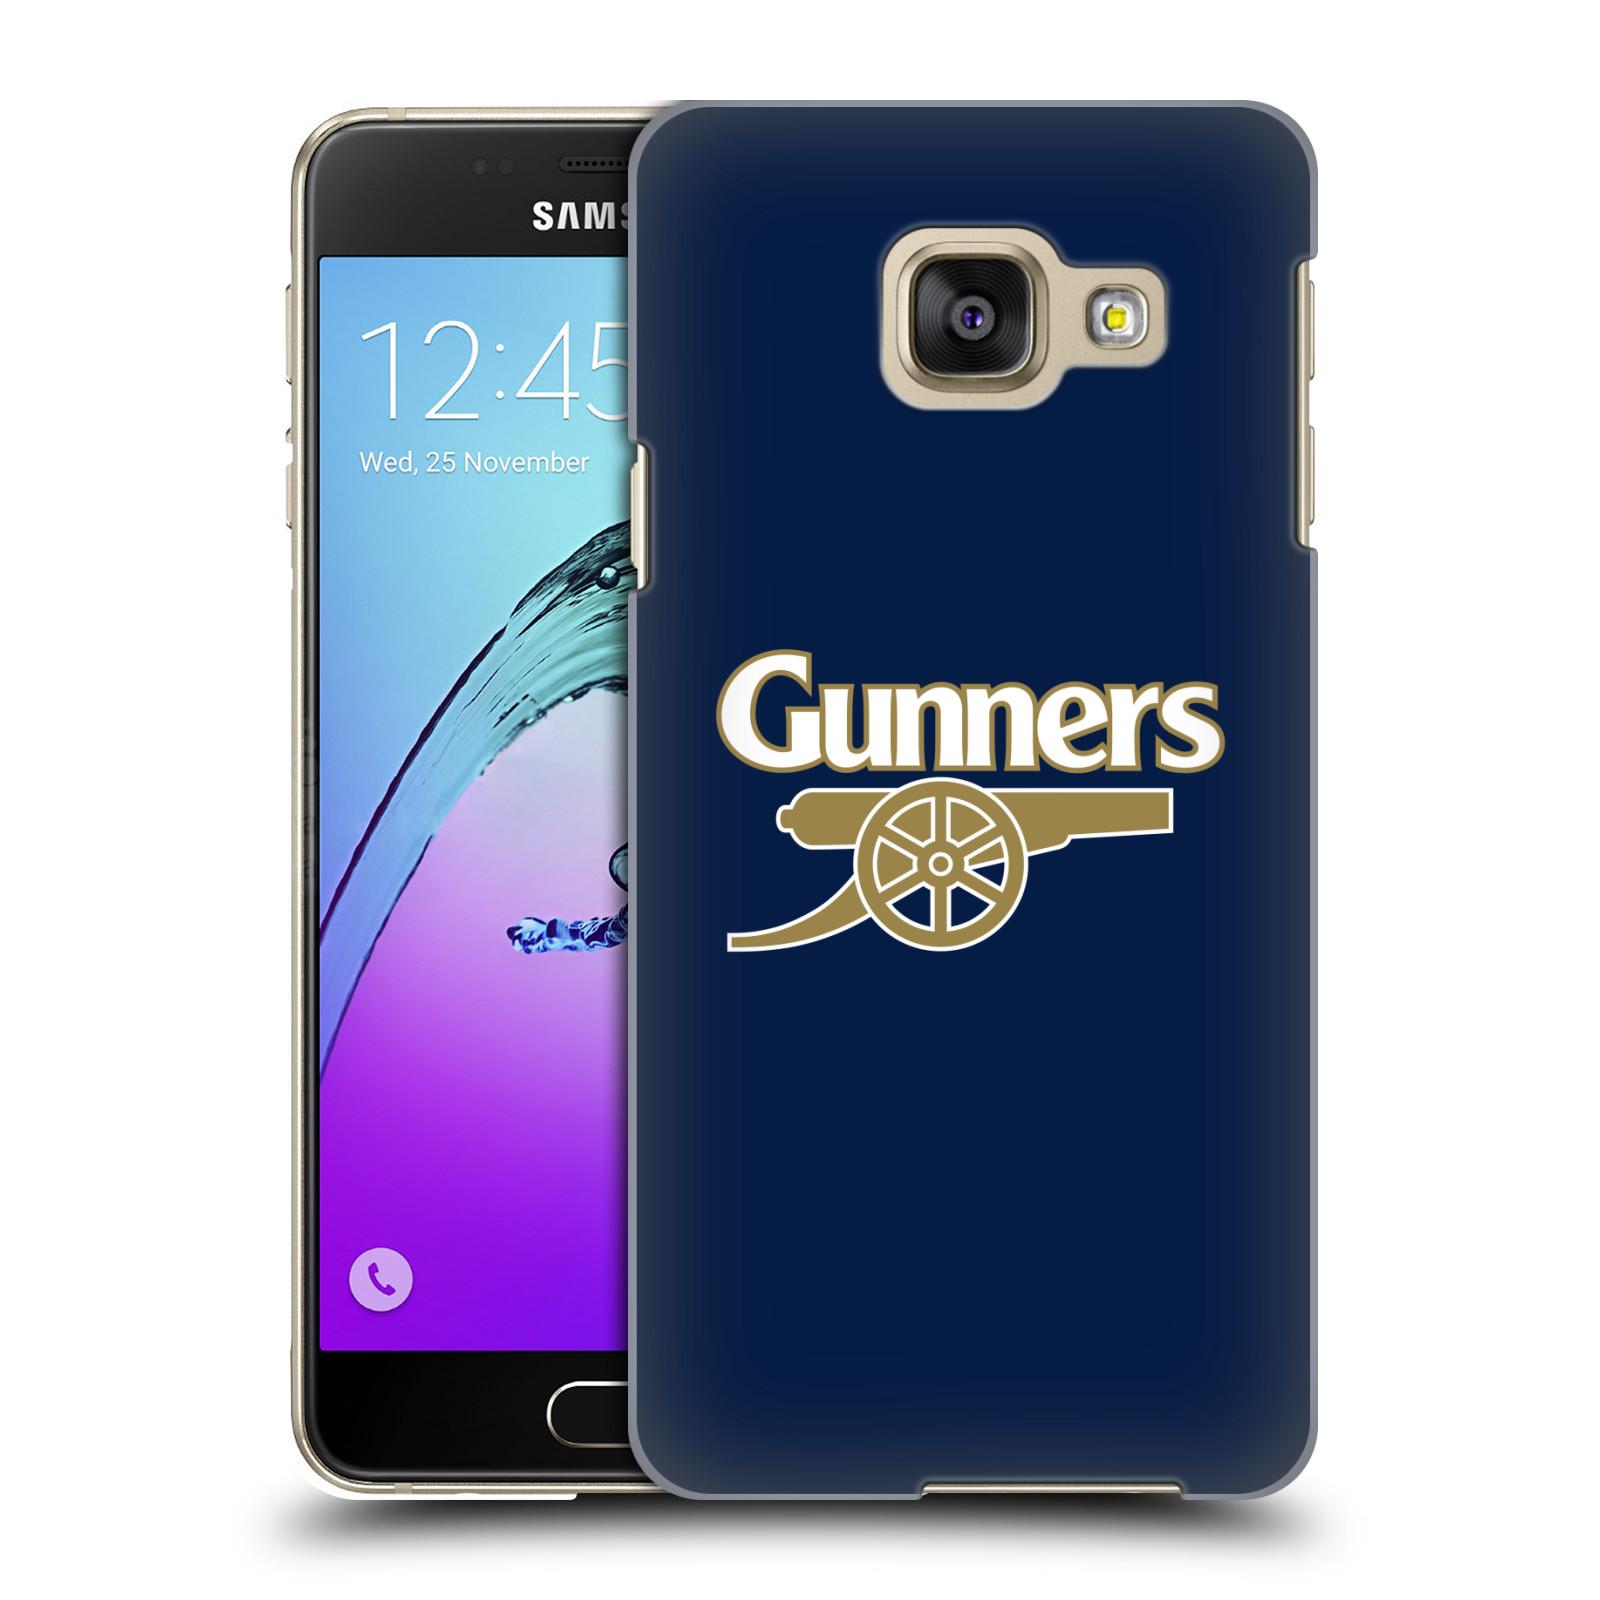 Plastové pouzdro na mobil Samsung Galaxy A3 (2016) - Head Case - Arsenal FC - Gunners